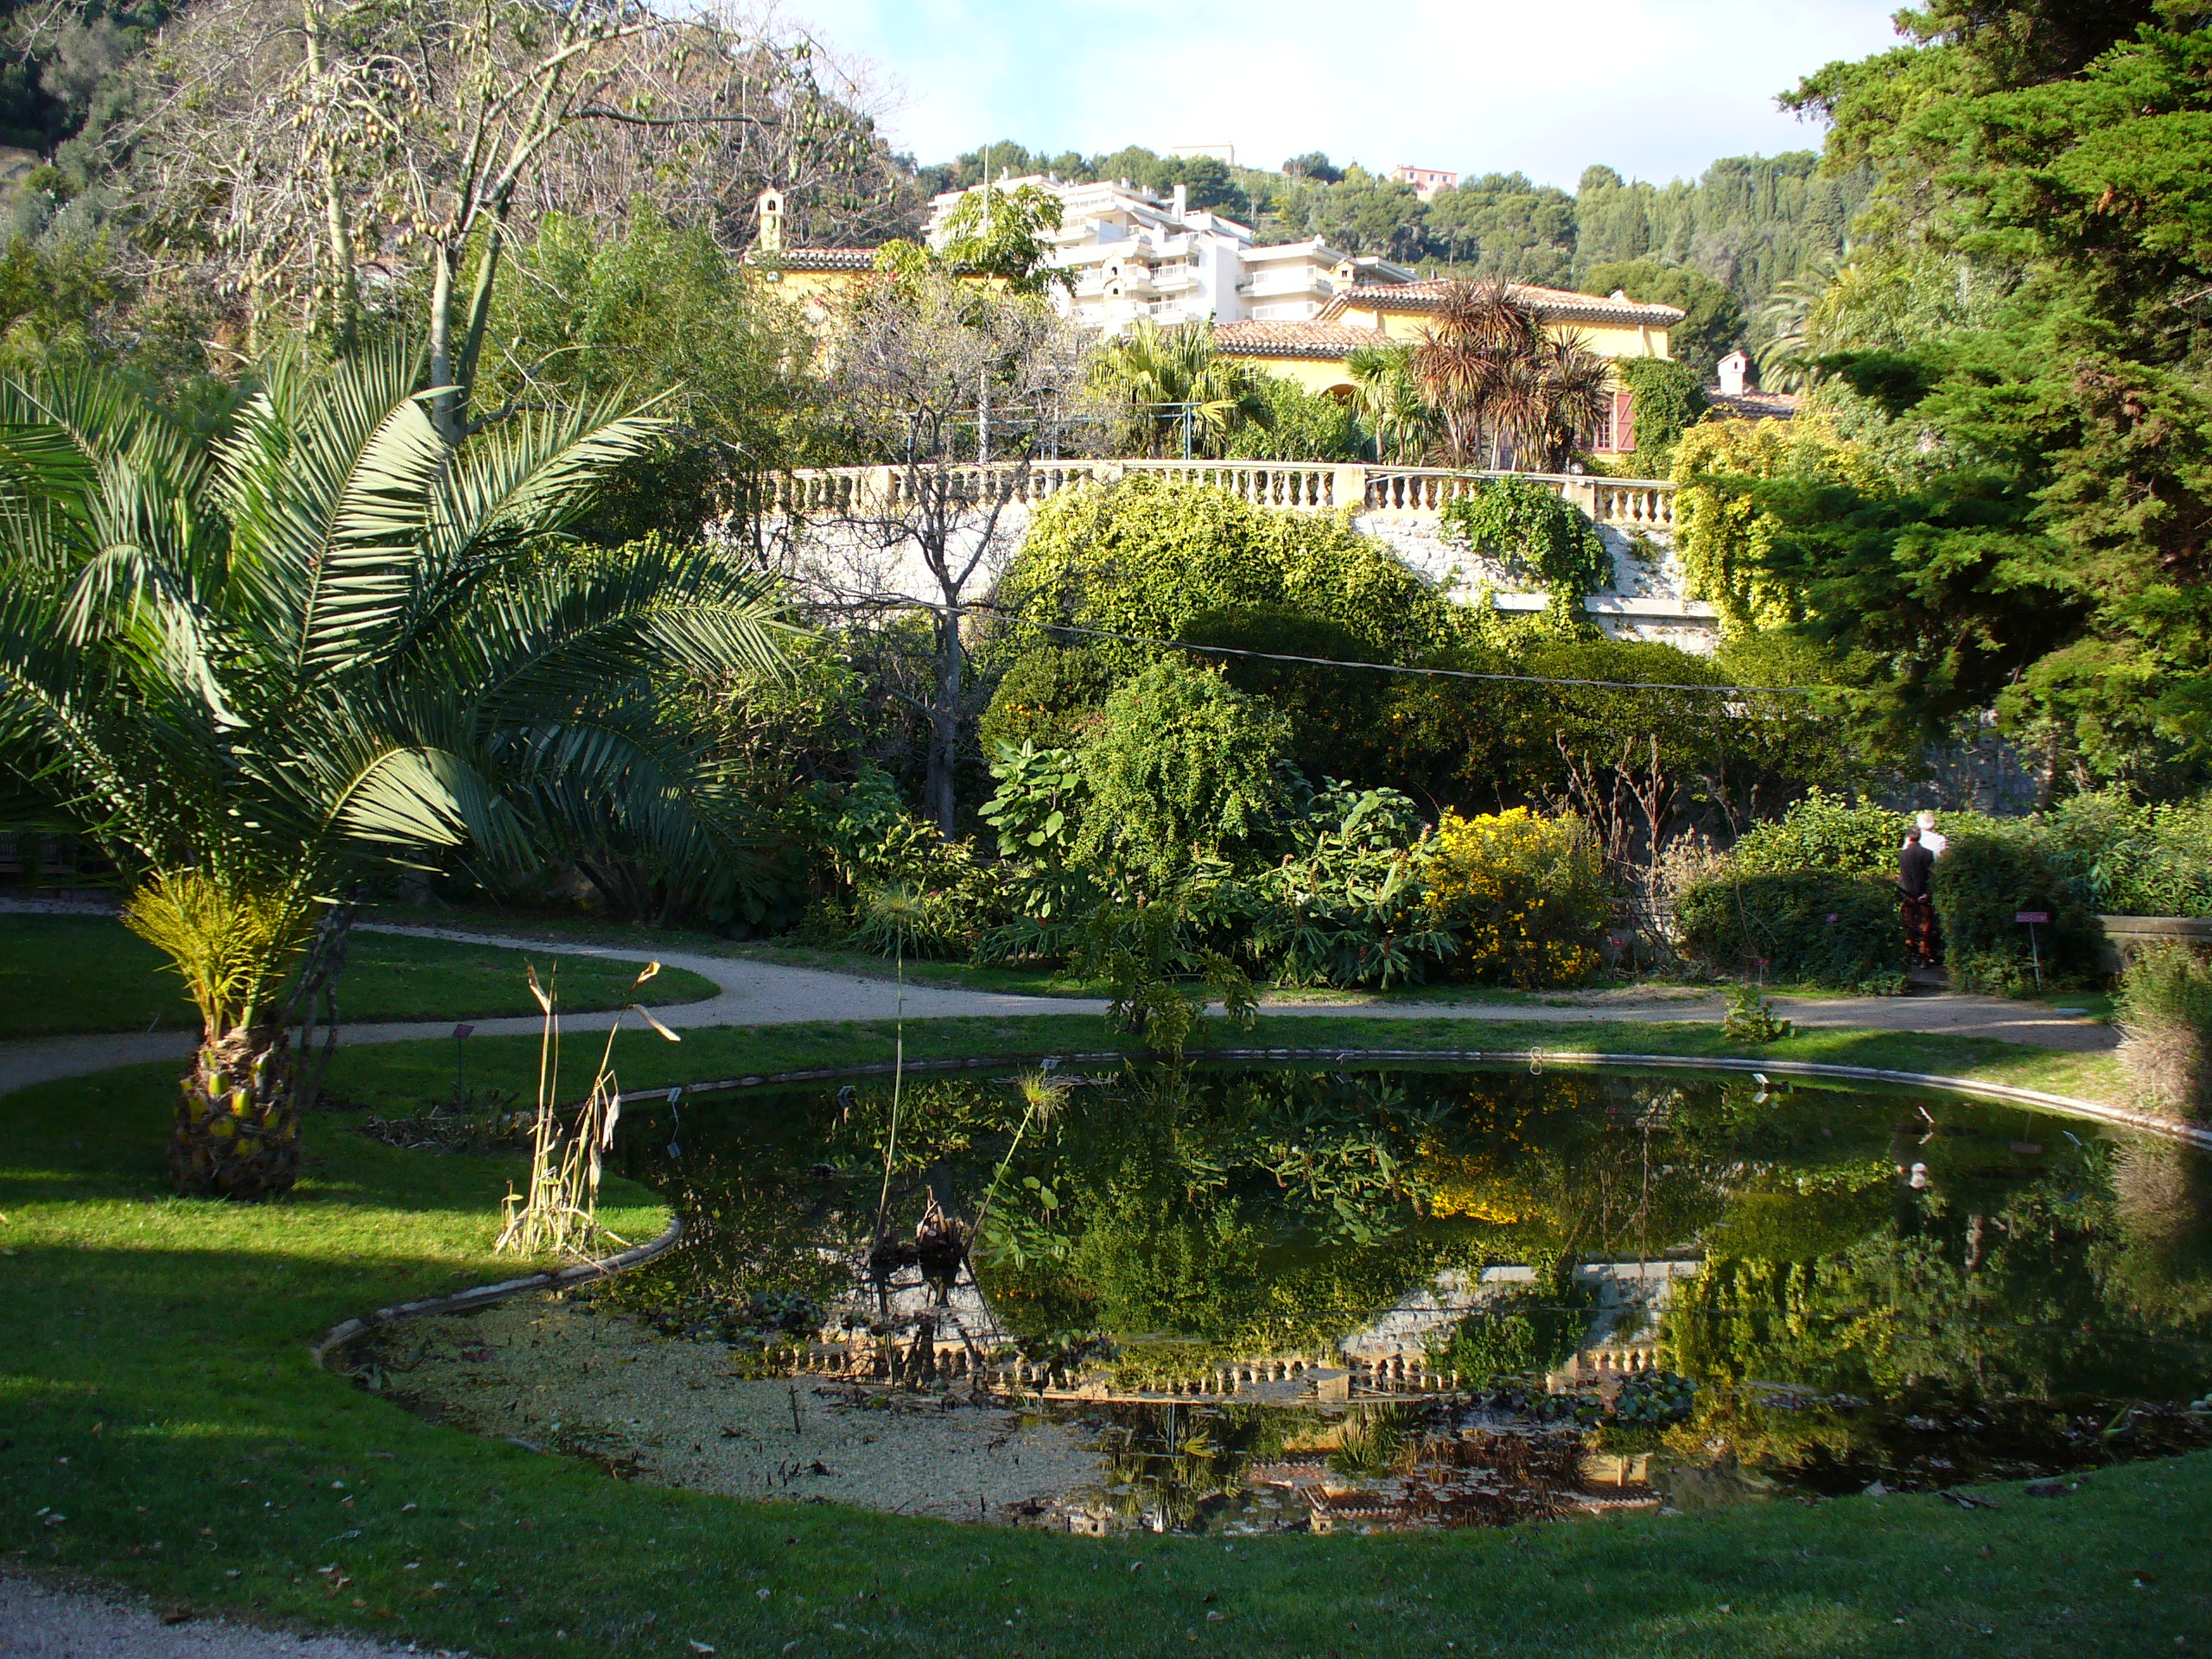 Jardin botanique du val rahmeh for Restaurant jardin botanique